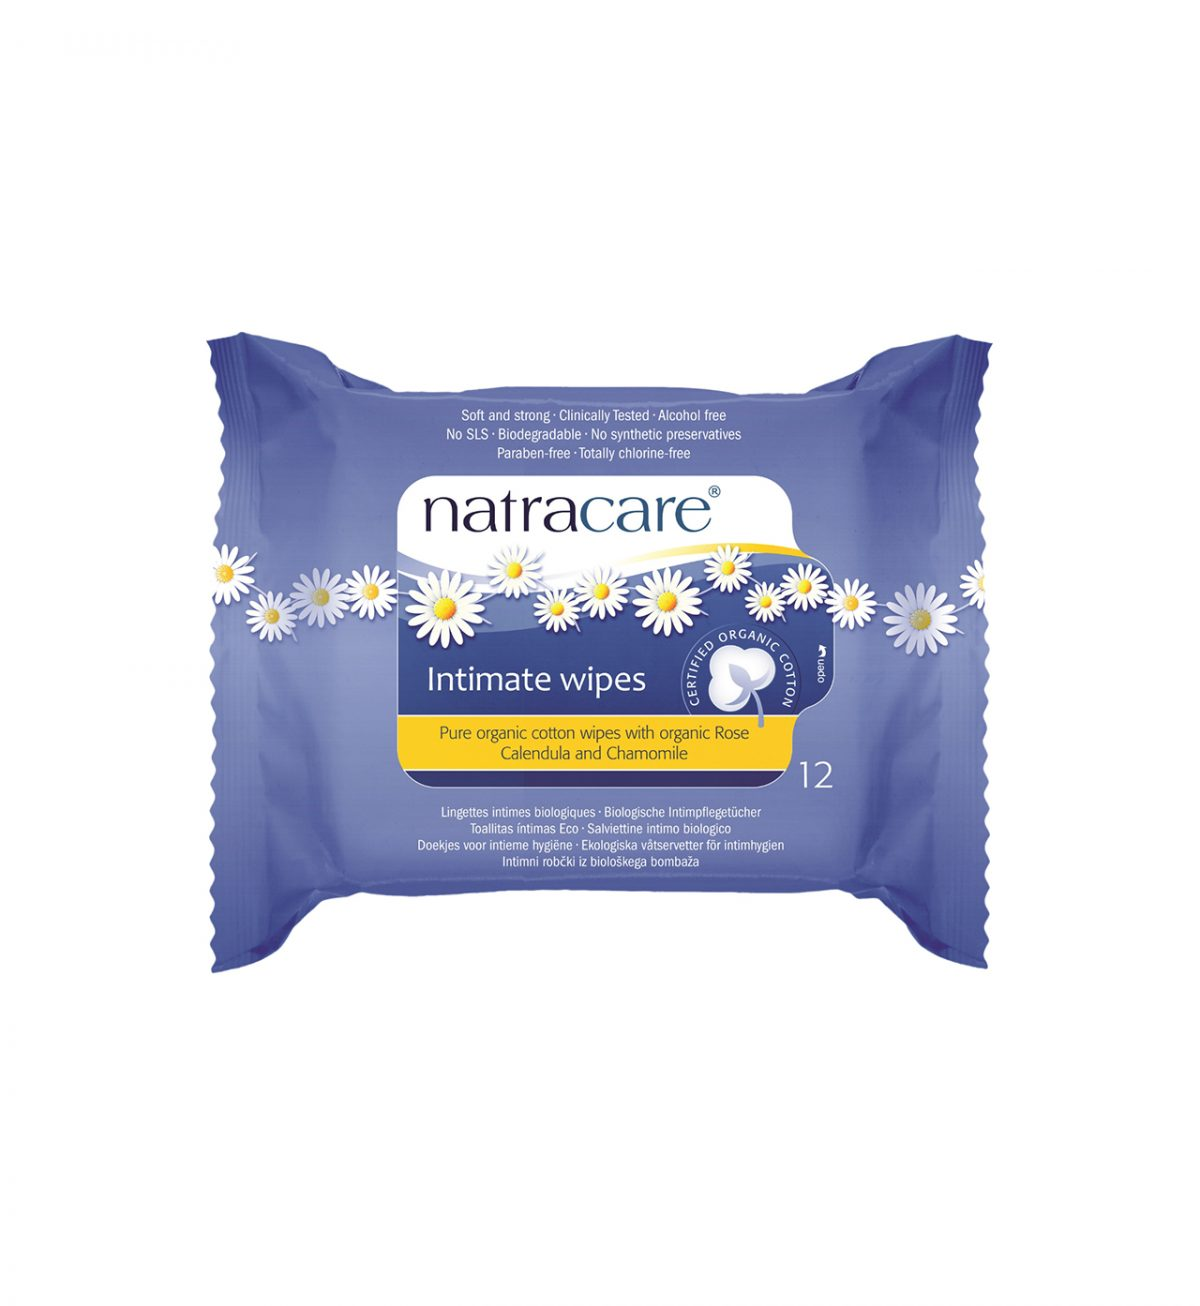 Intimservietter 12-pakning - Våtservietter av 100 % økologisk bomull - Natracare